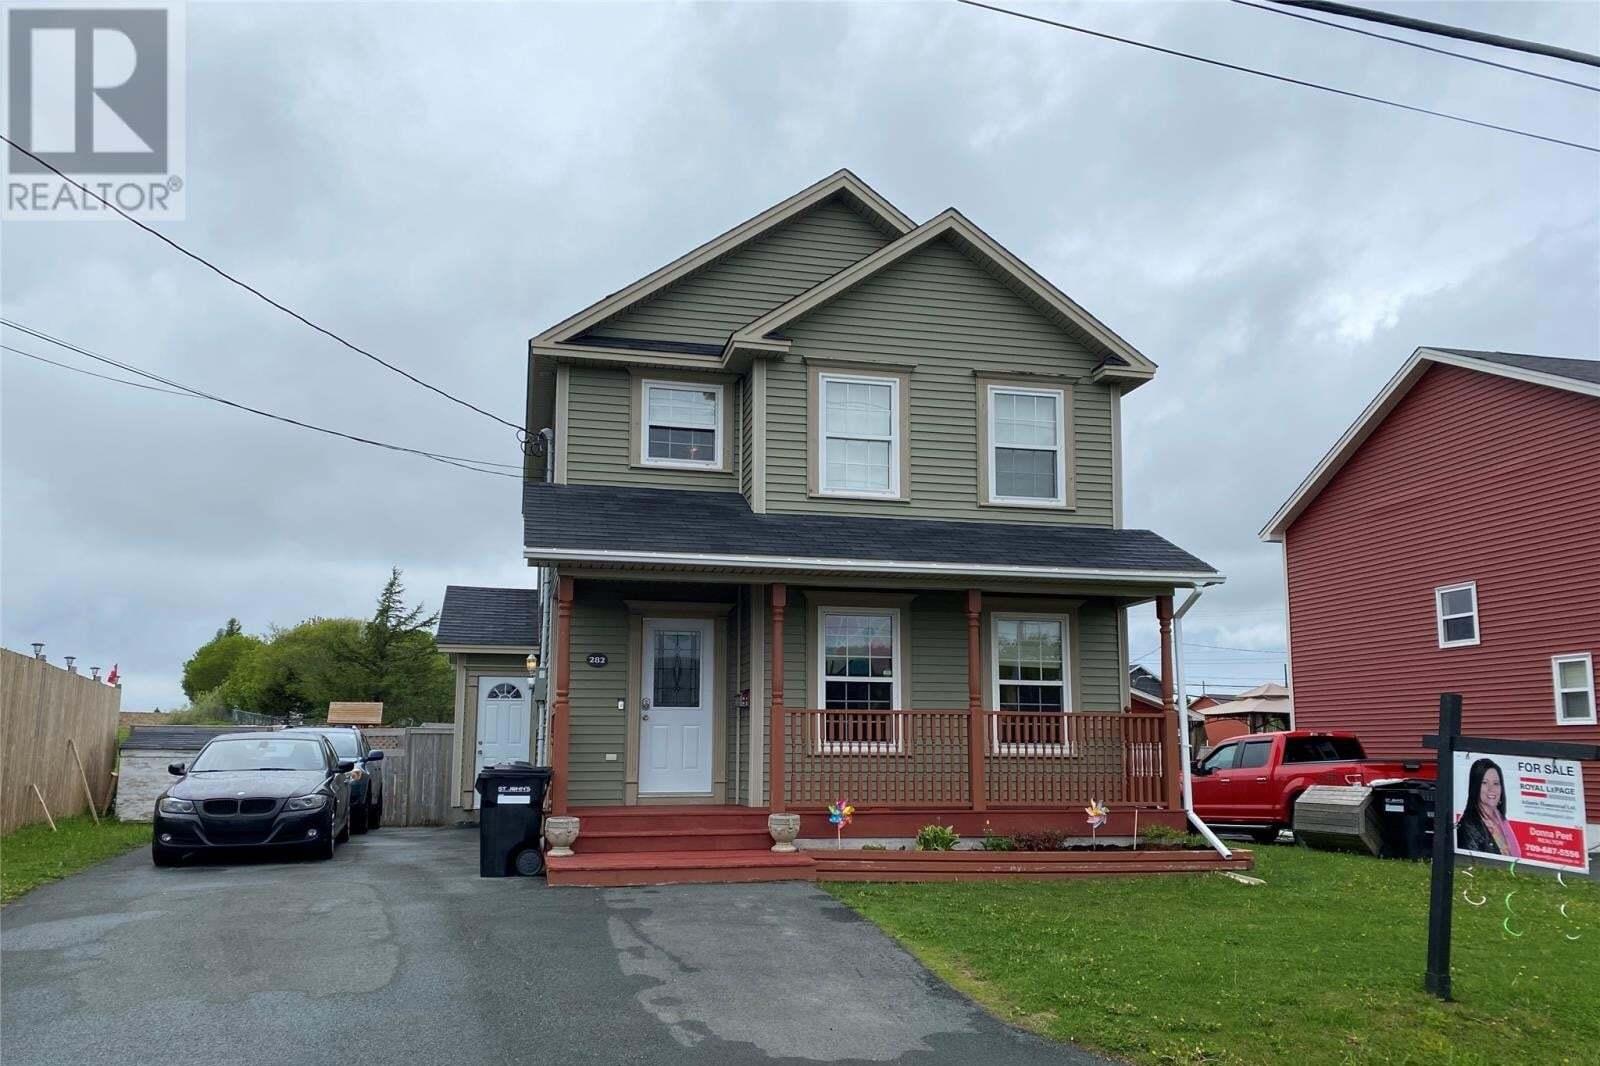 House for sale at 282 Bay Bulls Rd St. John's Newfoundland - MLS: 1213603